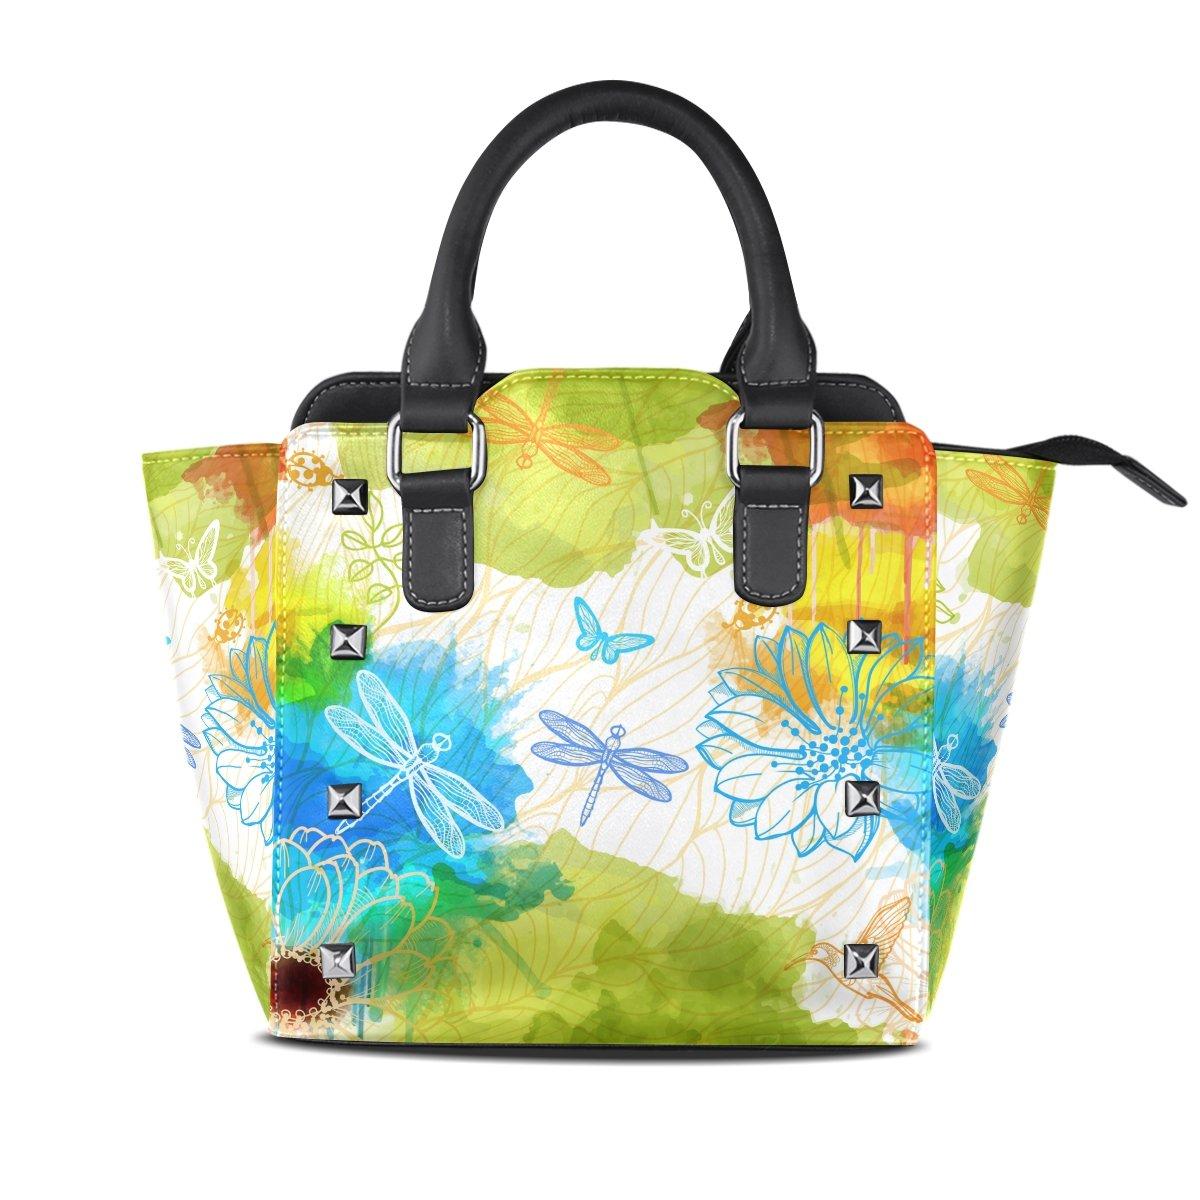 imobaby Fantasy Dragonflies PU Leather Top-Handle Handbags Single-Shoulder Tote Crossbody Bag Messenger Bags For Women